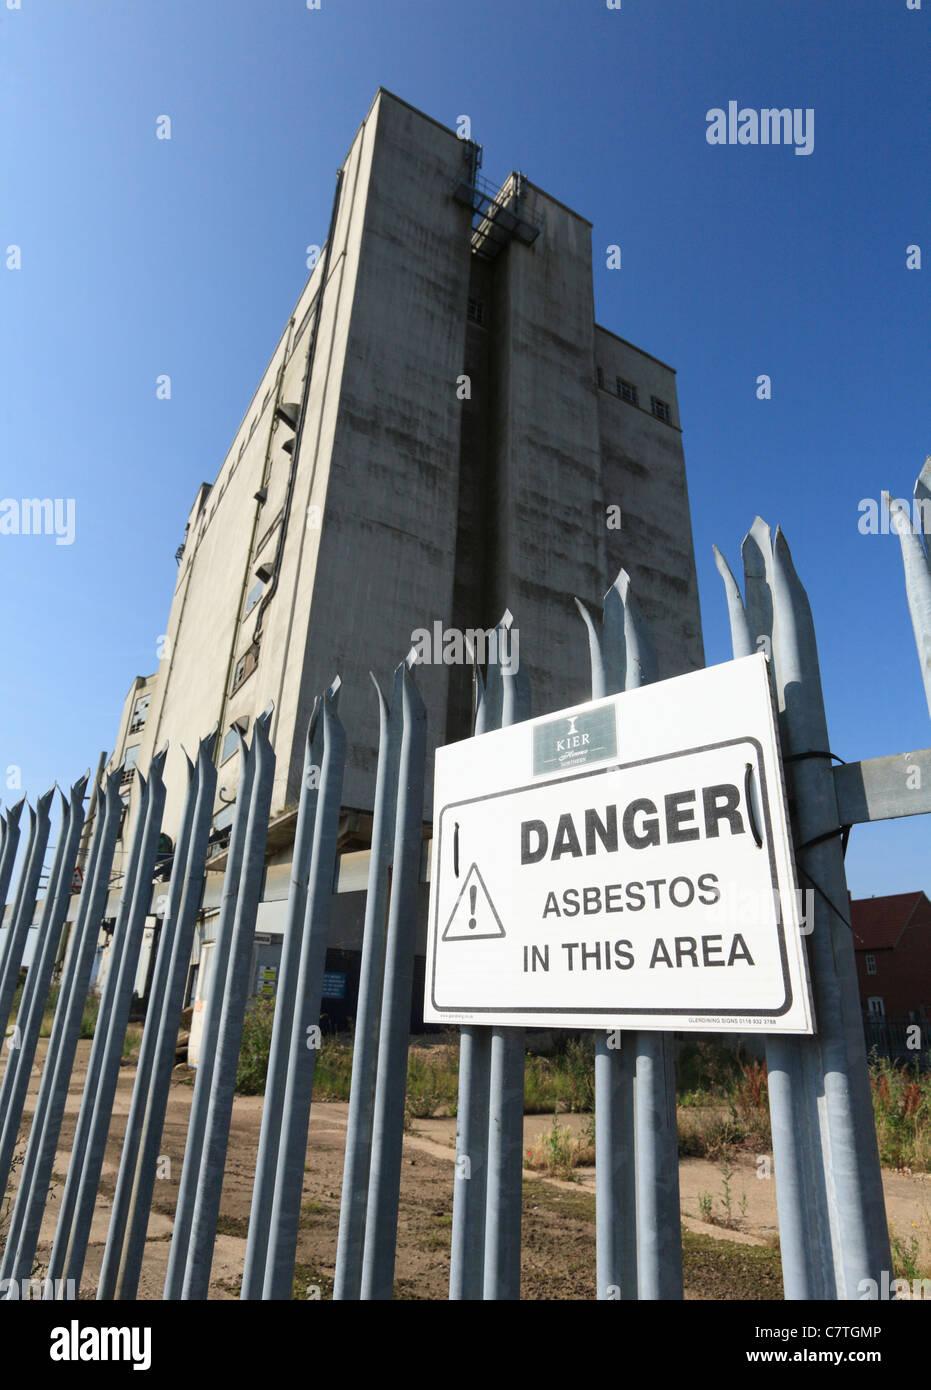 Asbestos danger warning sign outside the derelict Louth Malt Kiln building. - Stock Image